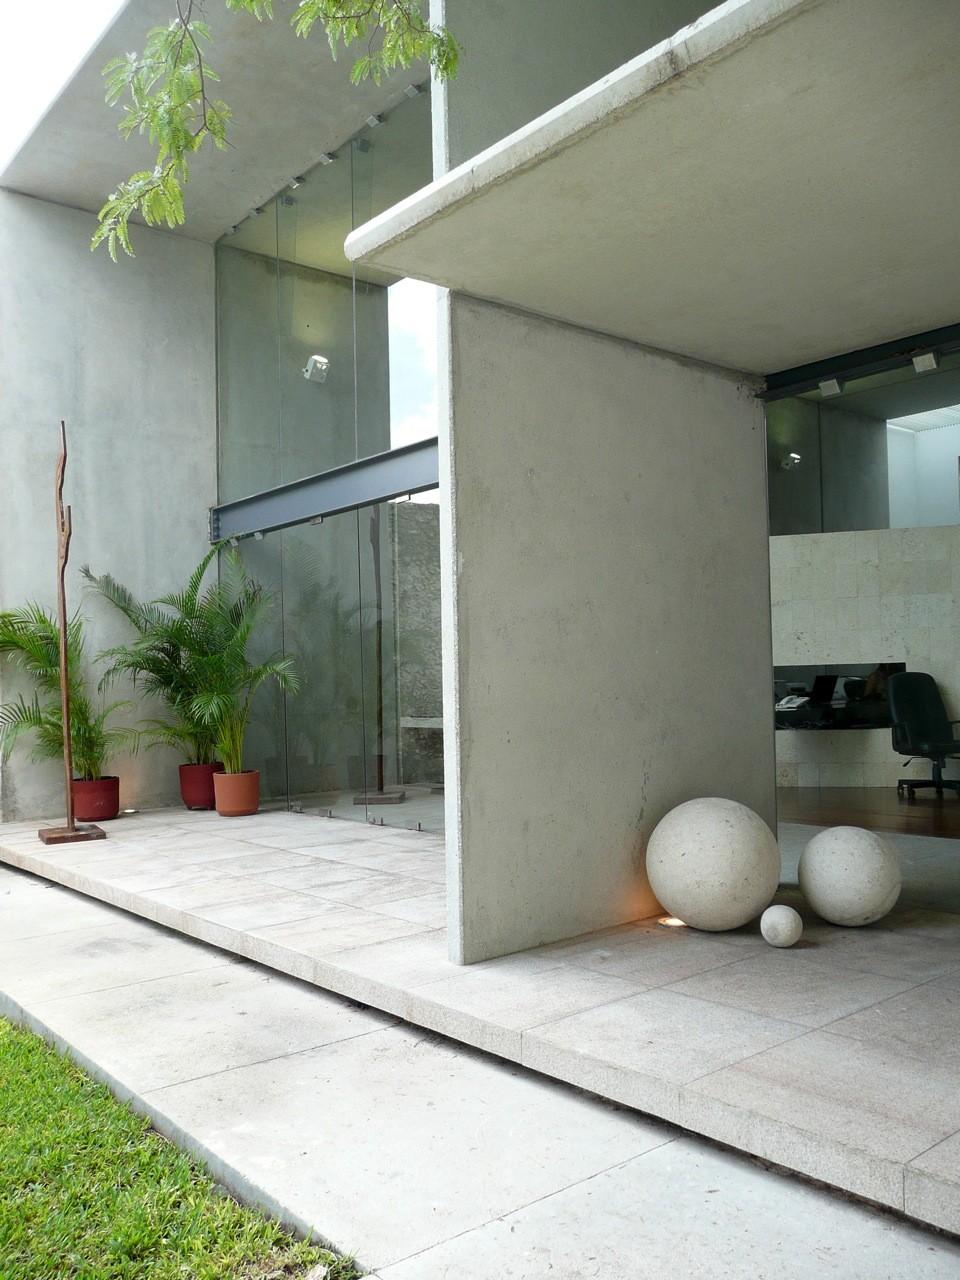 Galer a de estudio de arquitectos mu oz arquitectos 2 - Estudio de arquitectos ...